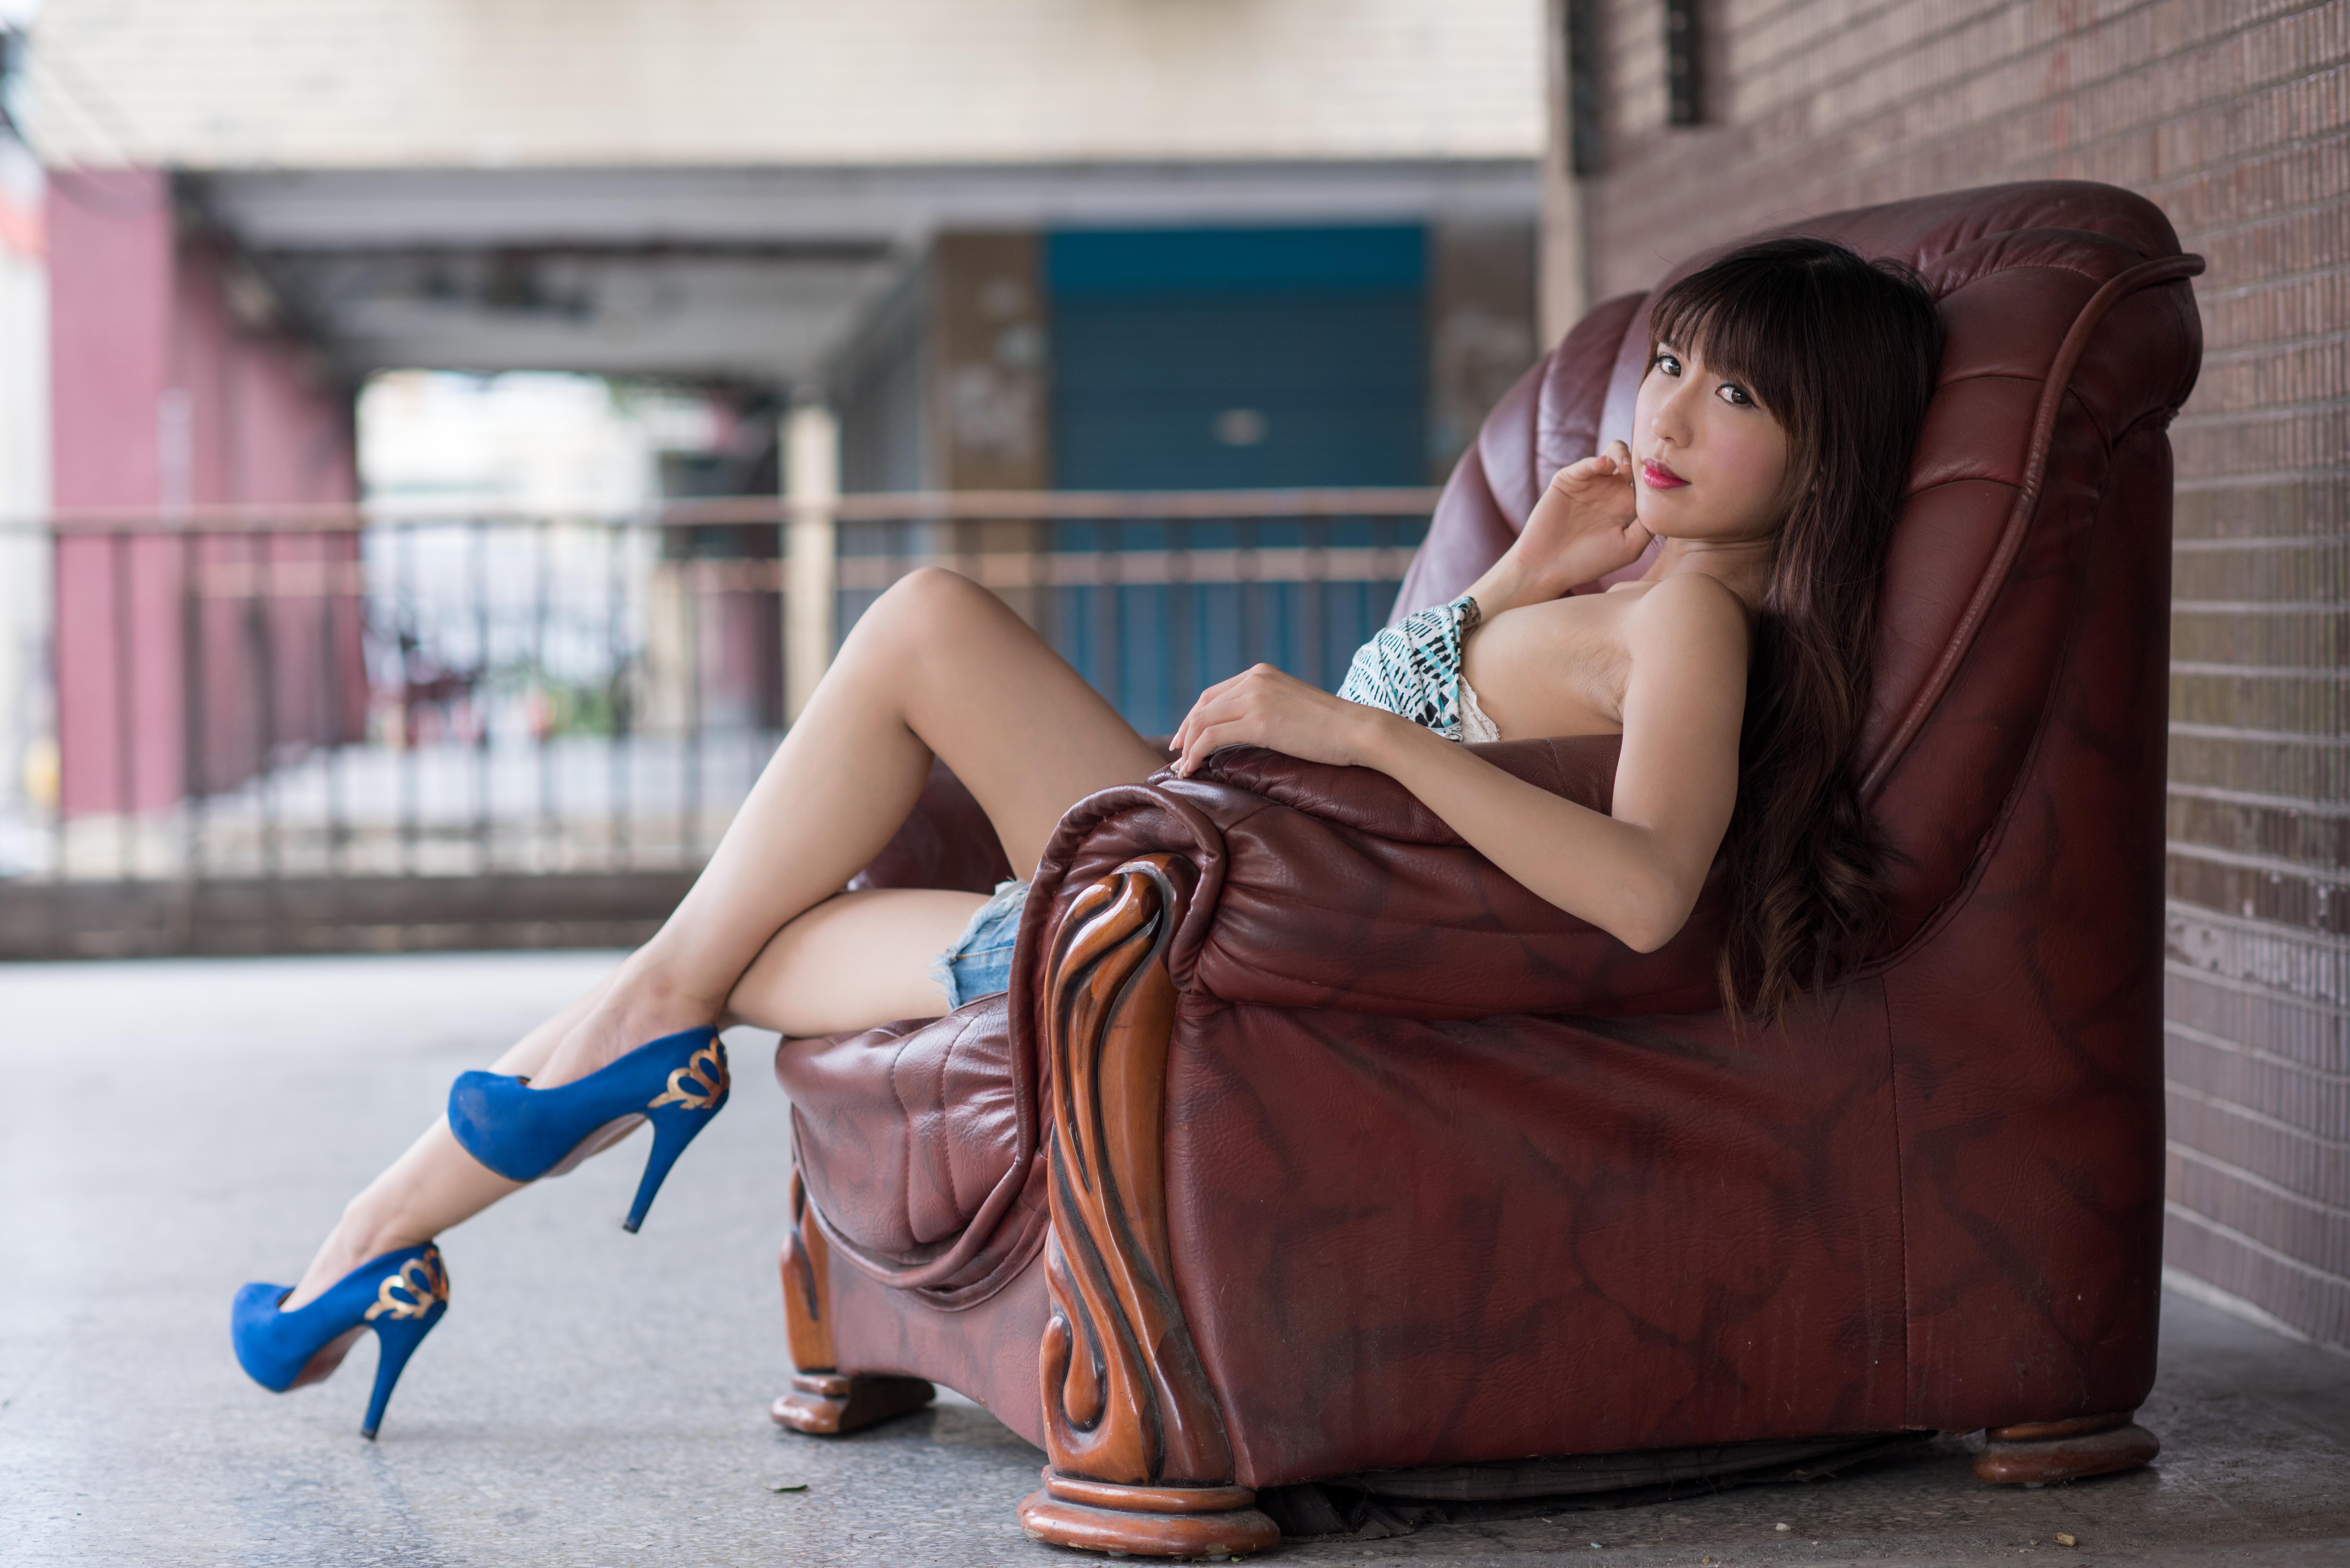 симпатичная девушка сидит на лице - 10